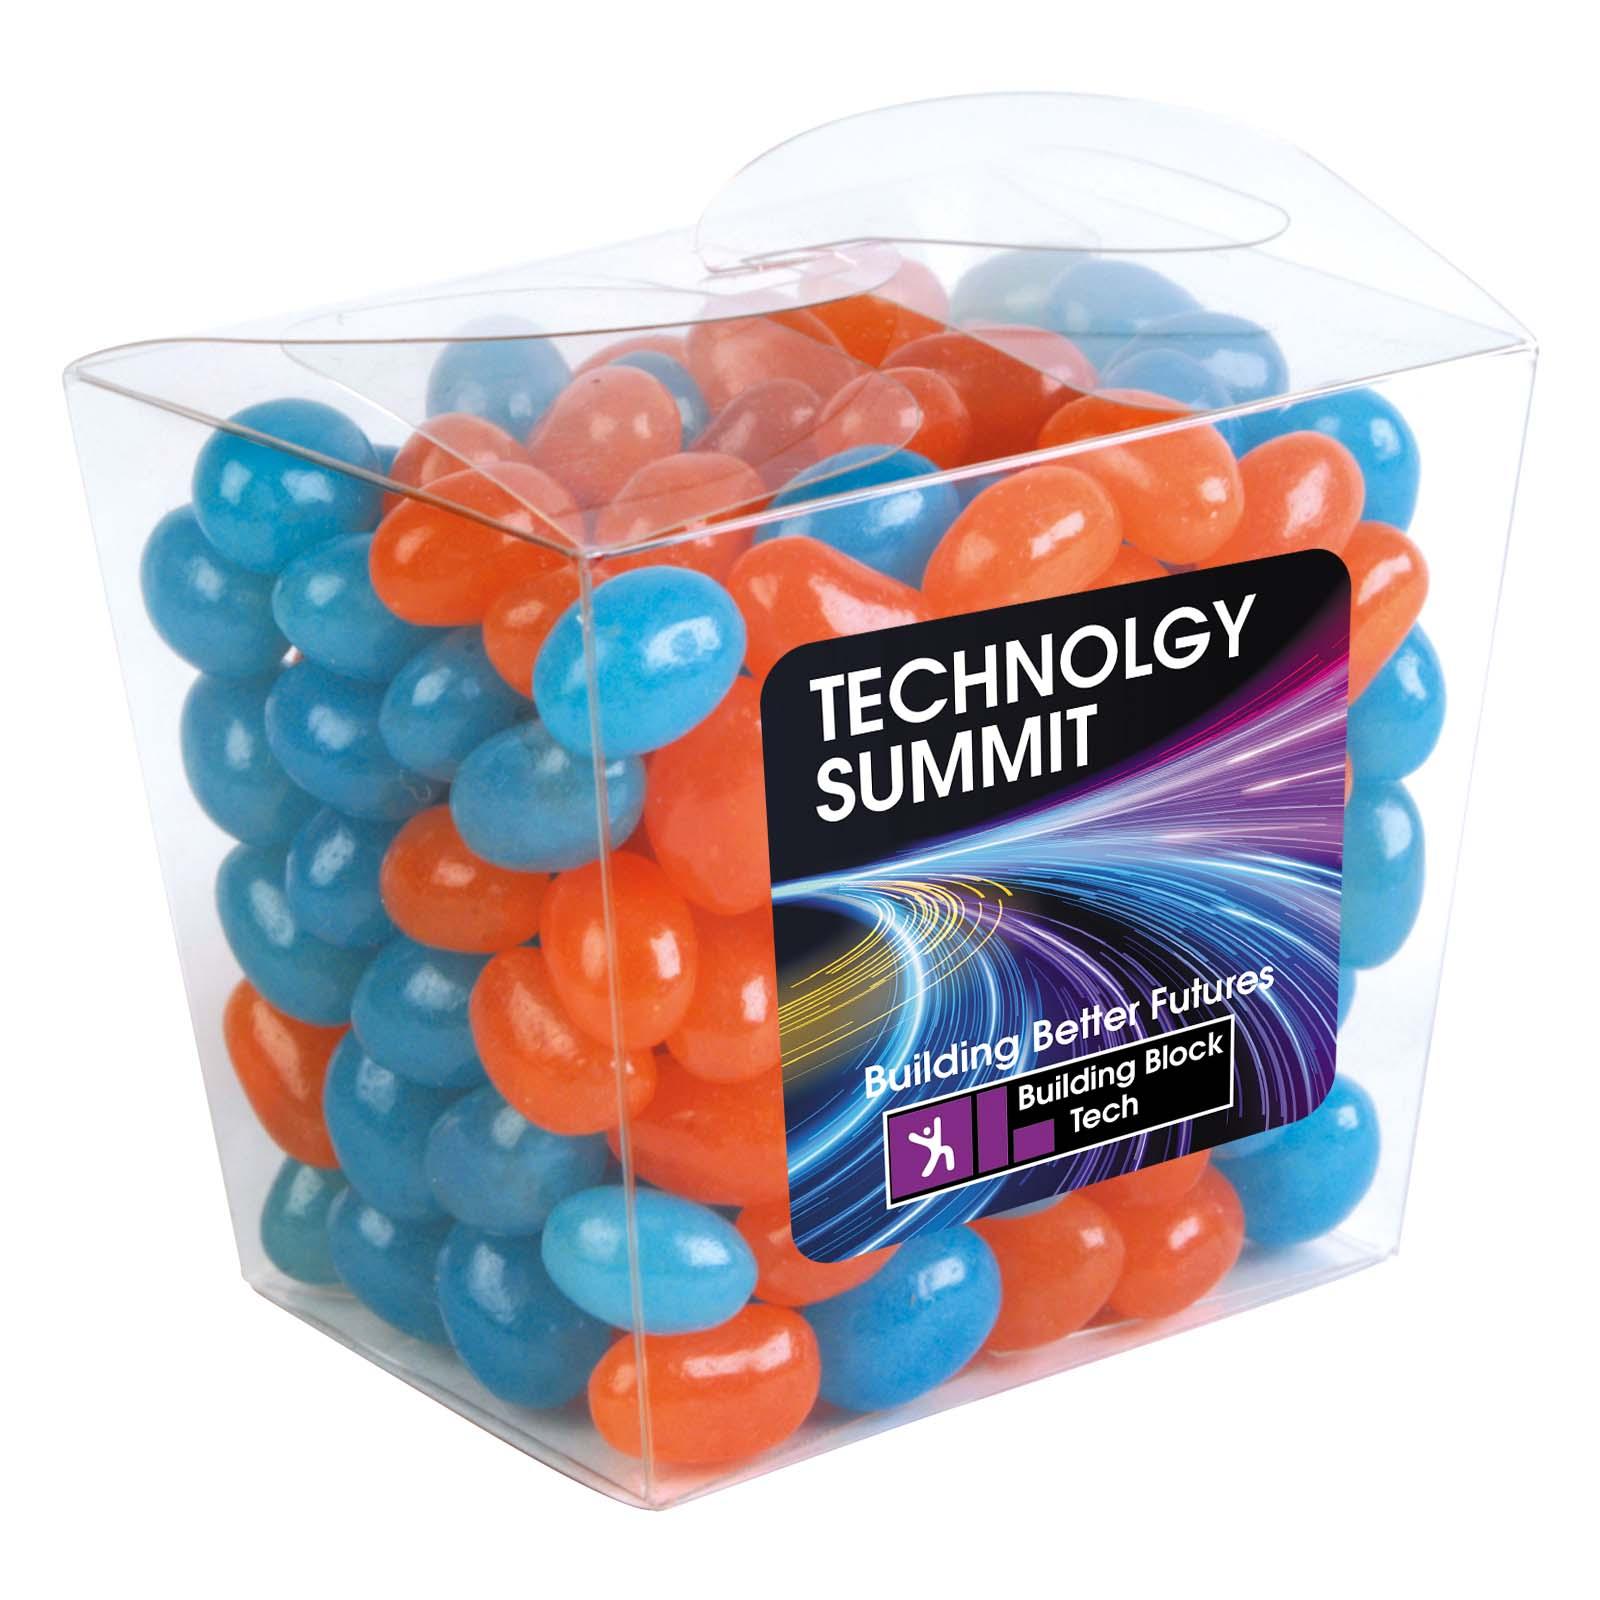 Corporate Colour Mini Jelly Beans in Clear Mini Noodle Box